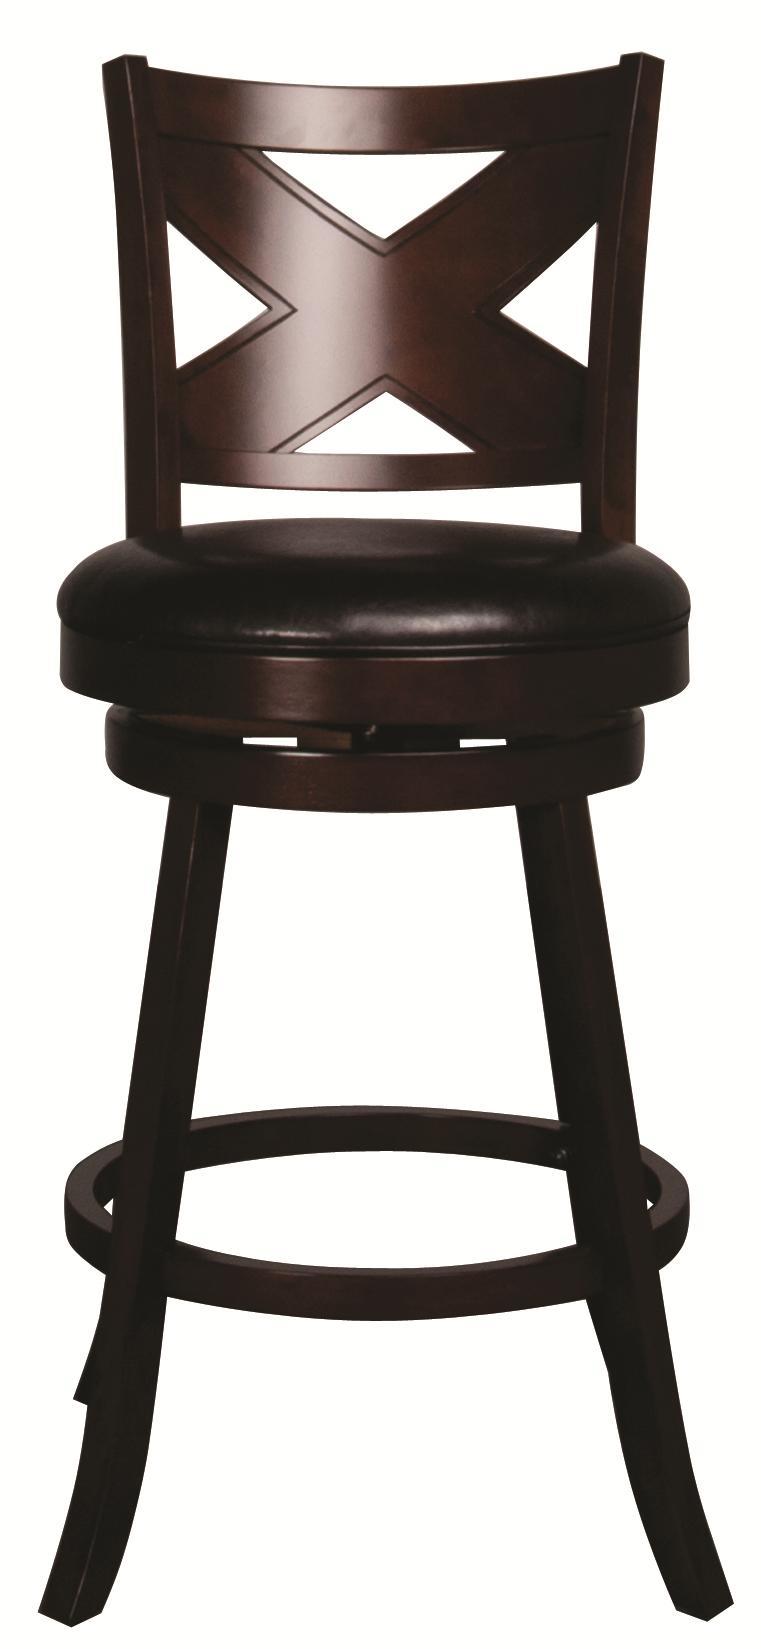 "Morris Home Metal Stools Auburn 30"" Upholstered Barstool - Item Number: 5209-830"